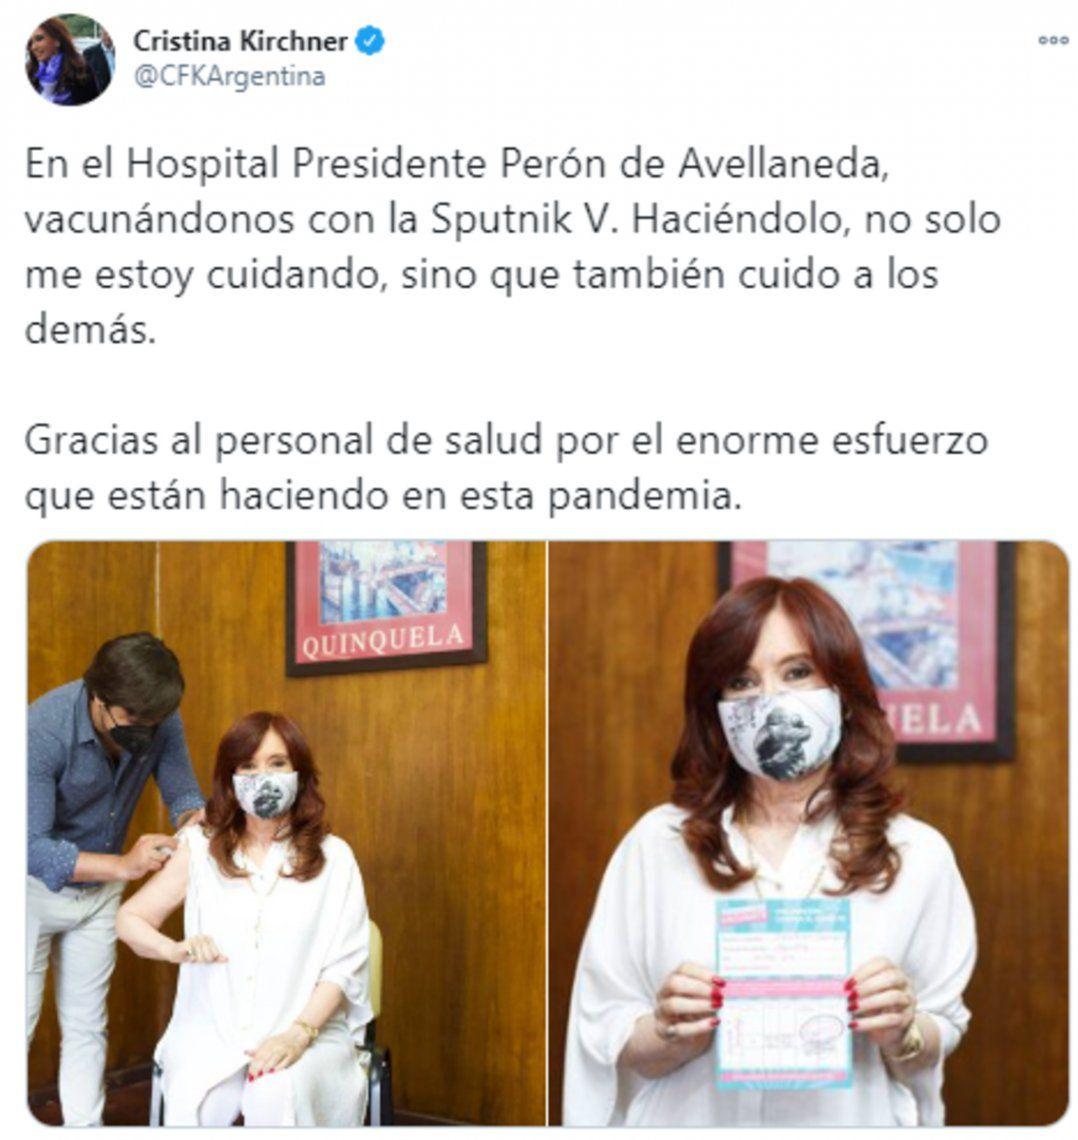 Mensaje de la vicepresidenta Cristina Kirchner en su cuenta de twitter.